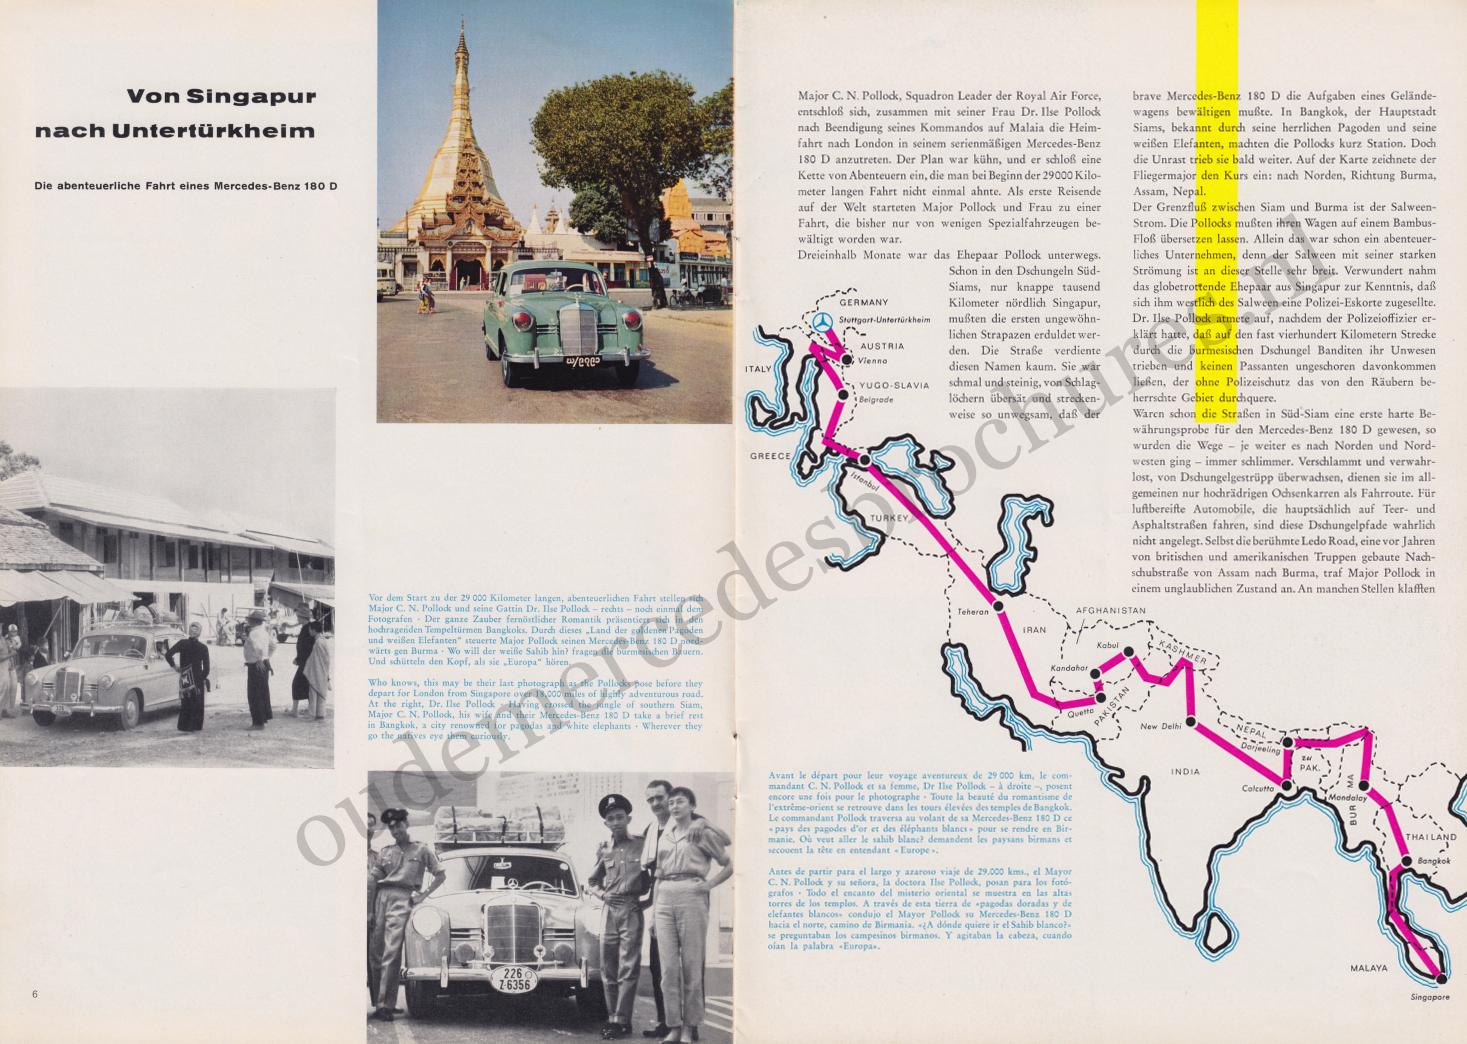 (REVISTA): Periódico In aller welt n.º 32 - Mercedes-Benz no mundo - 1959 - multilingue 004